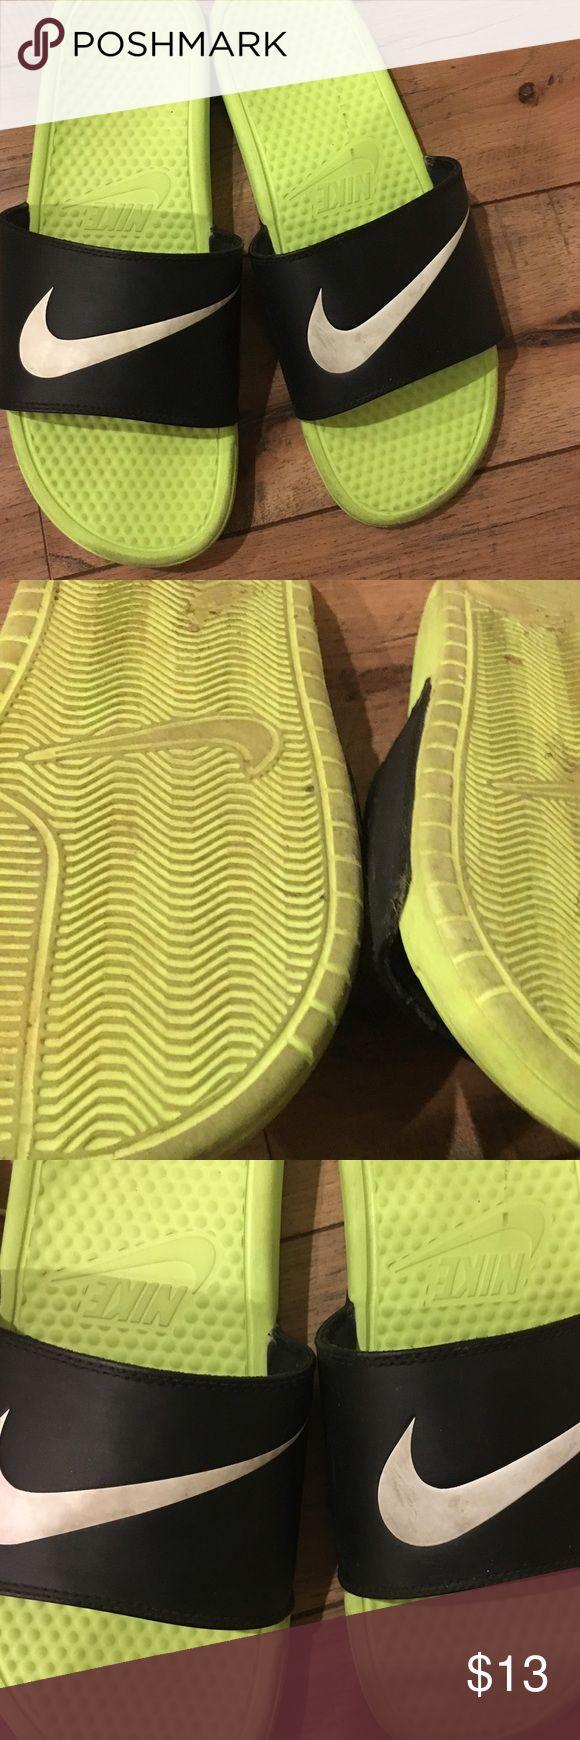 💚💛💚🖤men's Nike slides 💚 used size 13 men's Shoes